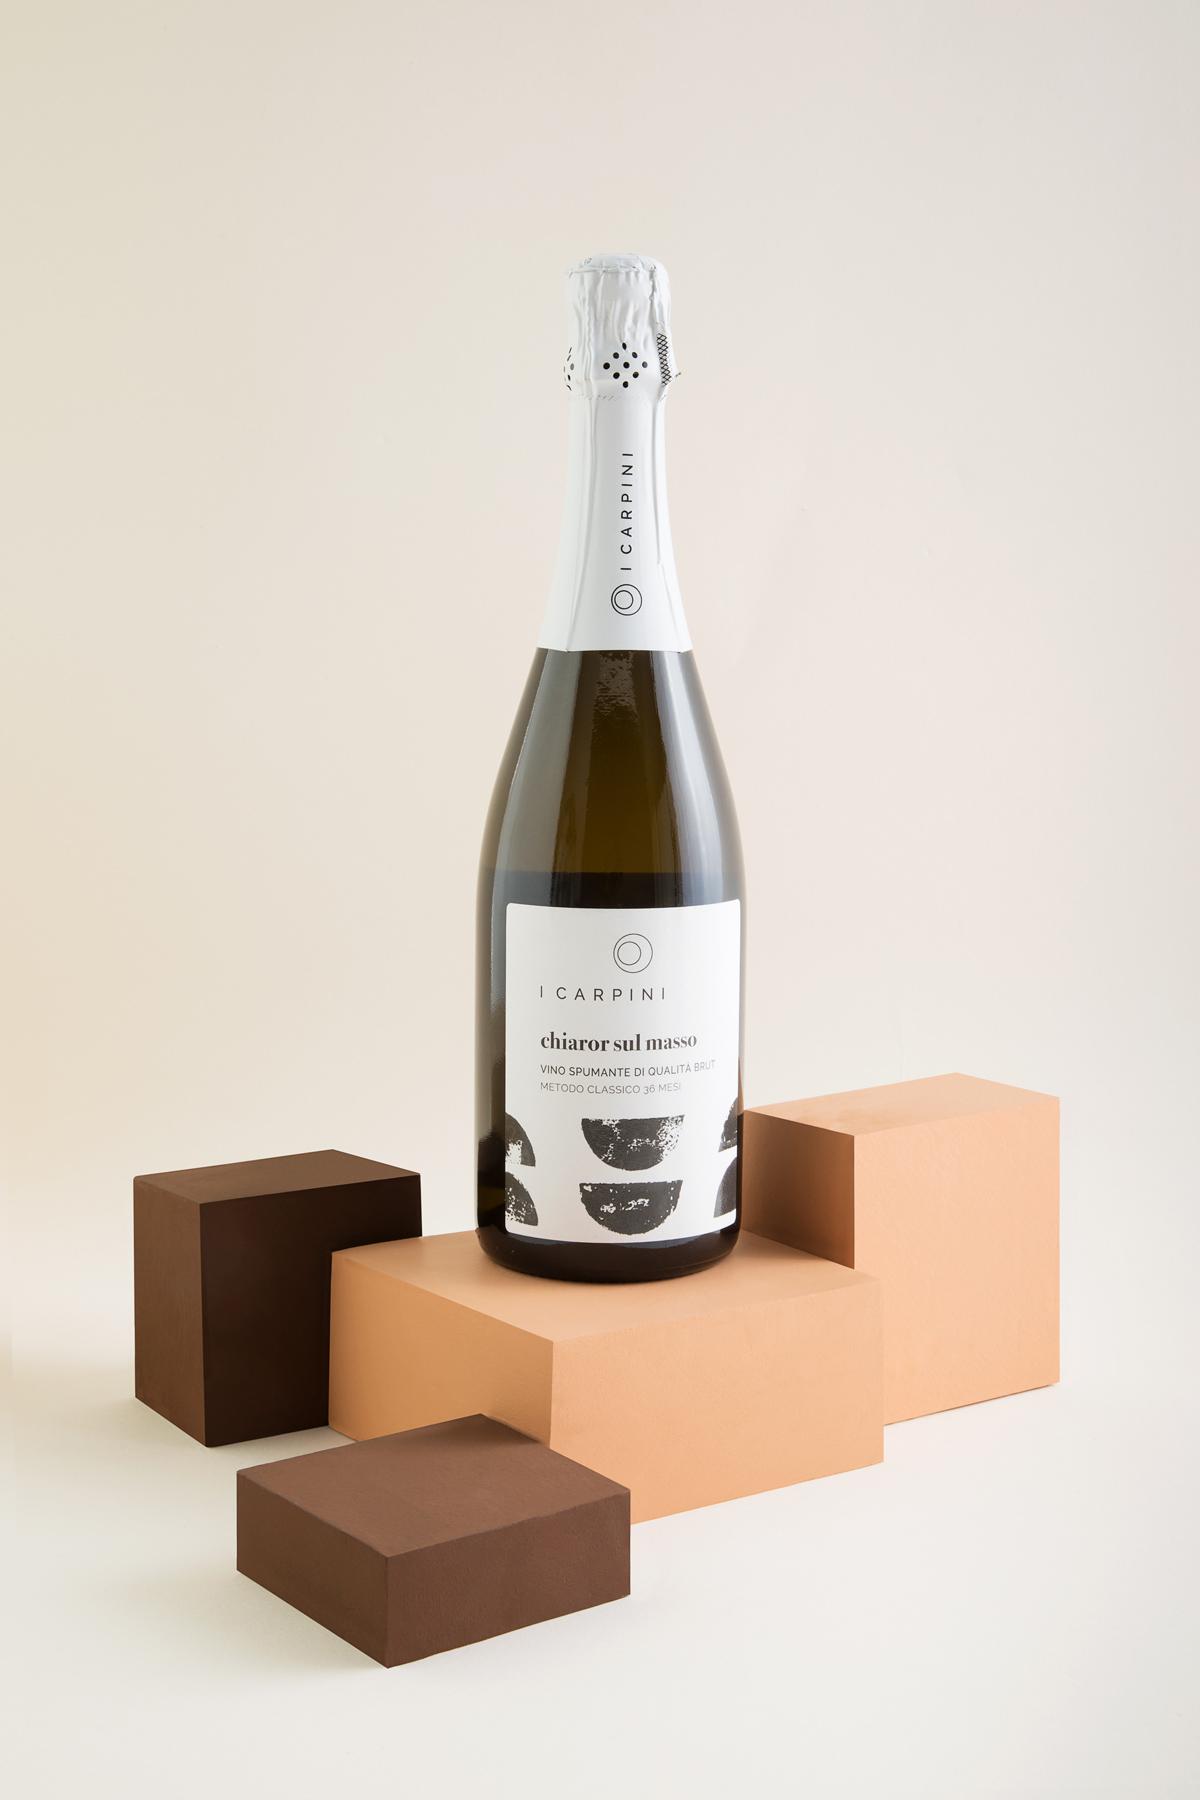 SPUMANTE_i_carpini_wine_packaging_design_wine_design_drogheria_studio_bianco